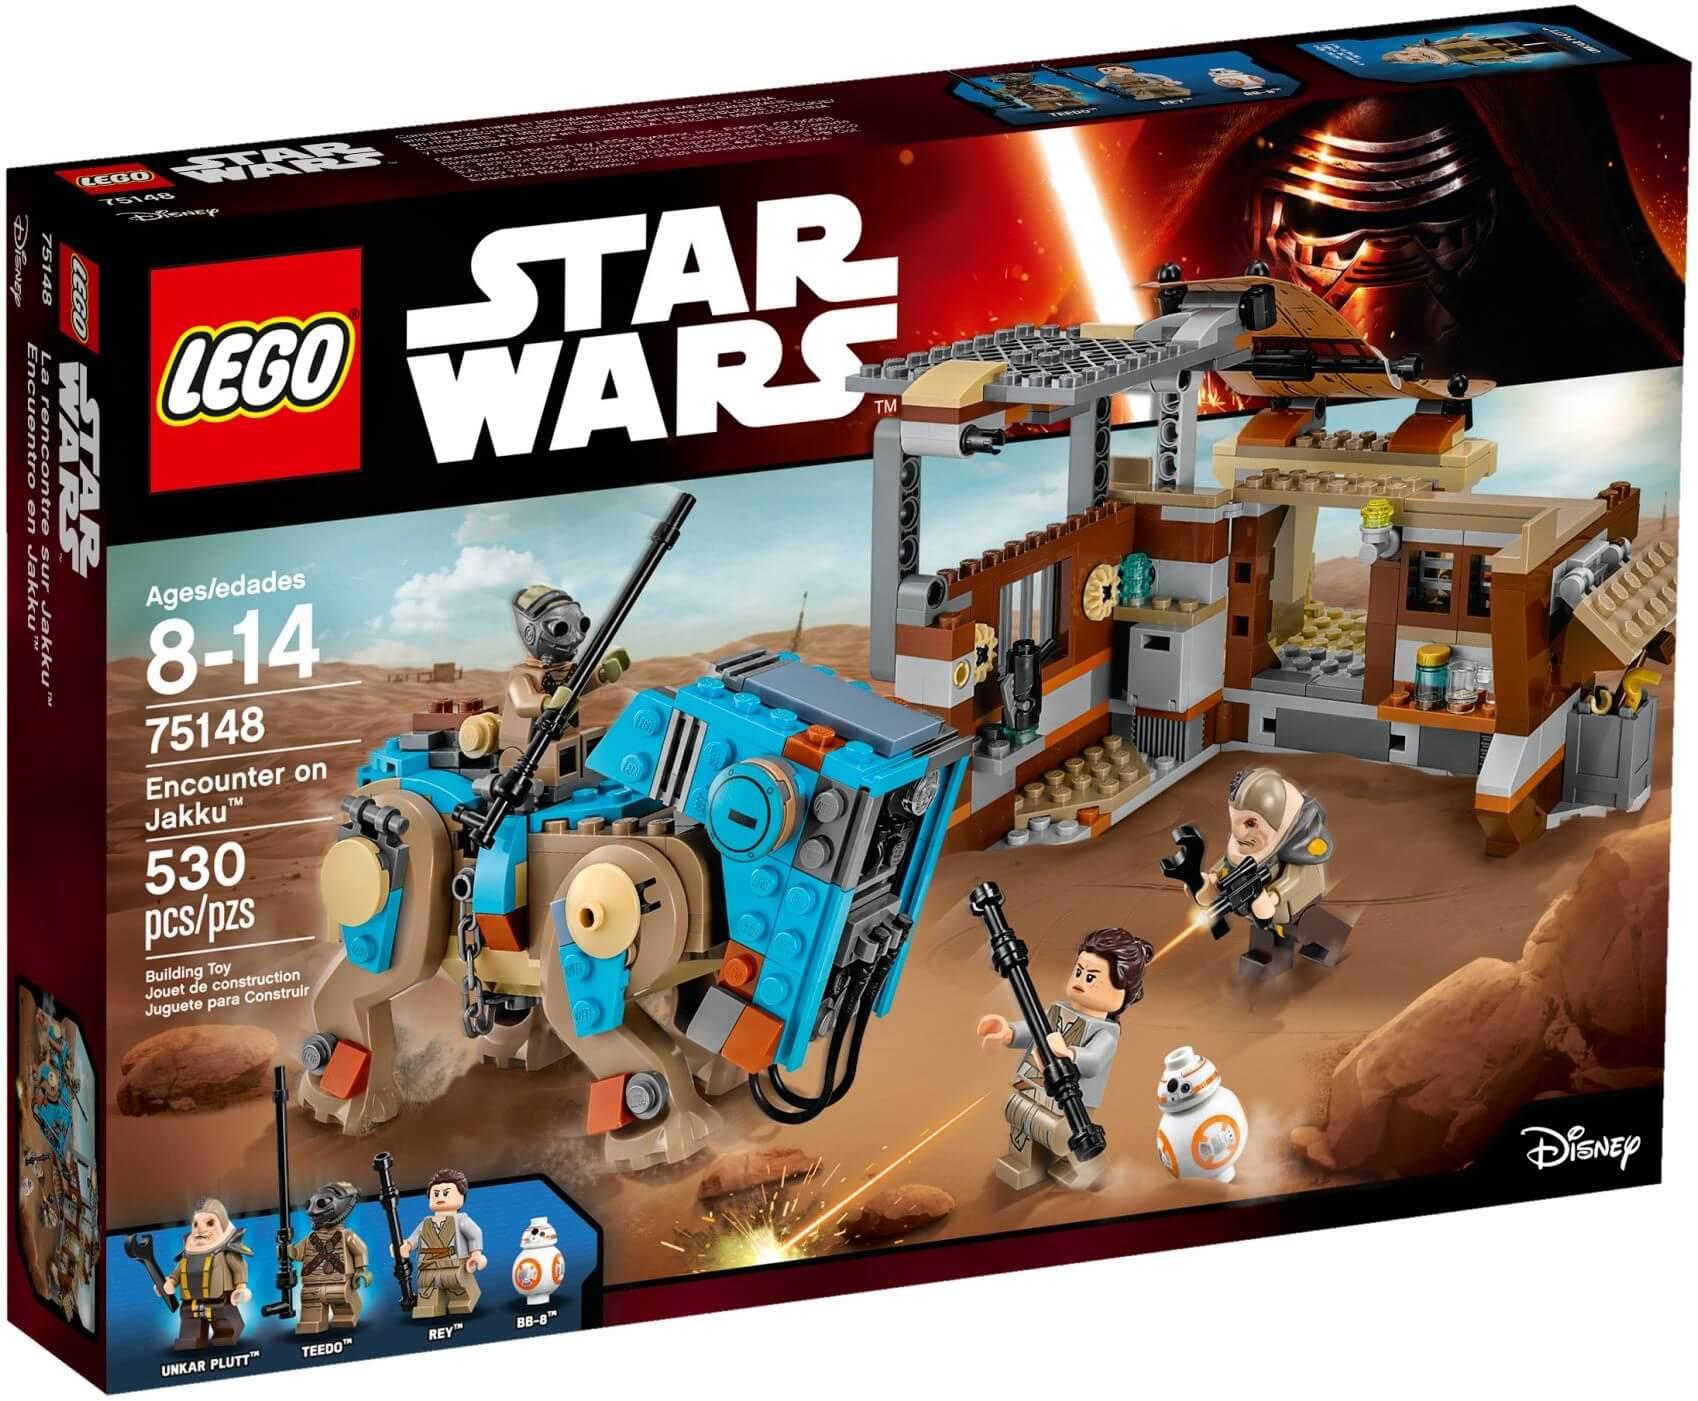 Mua đồ chơi LEGO 75148 - LEGO Star Wars 75148 - Khu Chợ Hành Tinh Jakku (LEGO Star Wars Encounter on Jakku 75148)